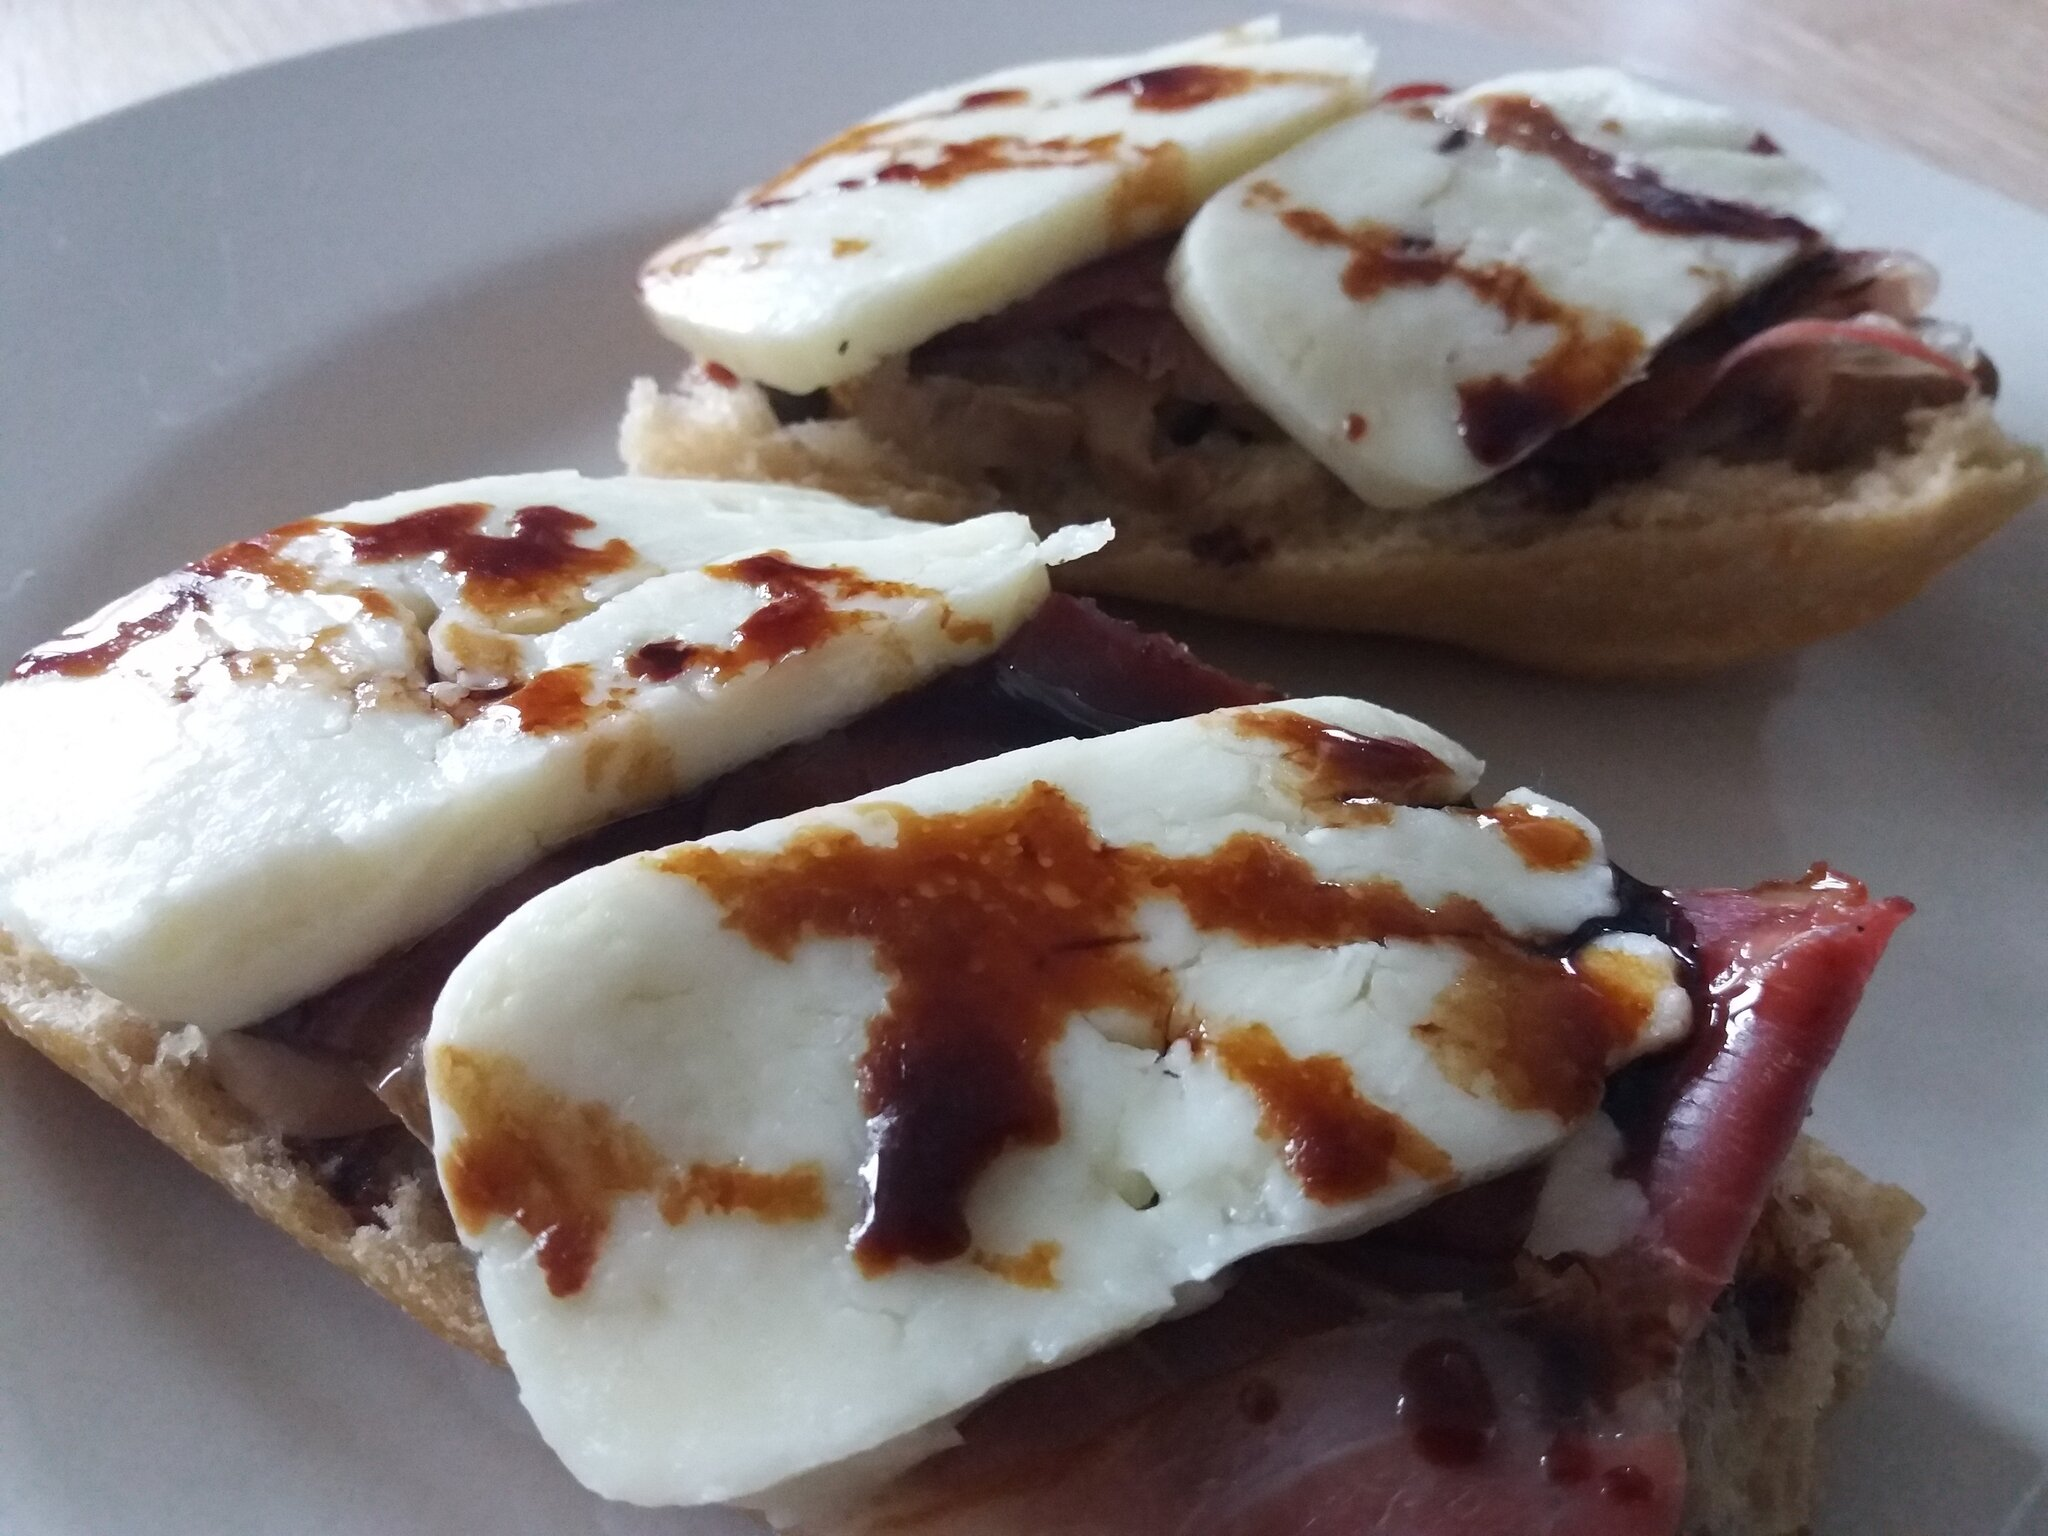 La tartine, la solution pour déjeuner malin